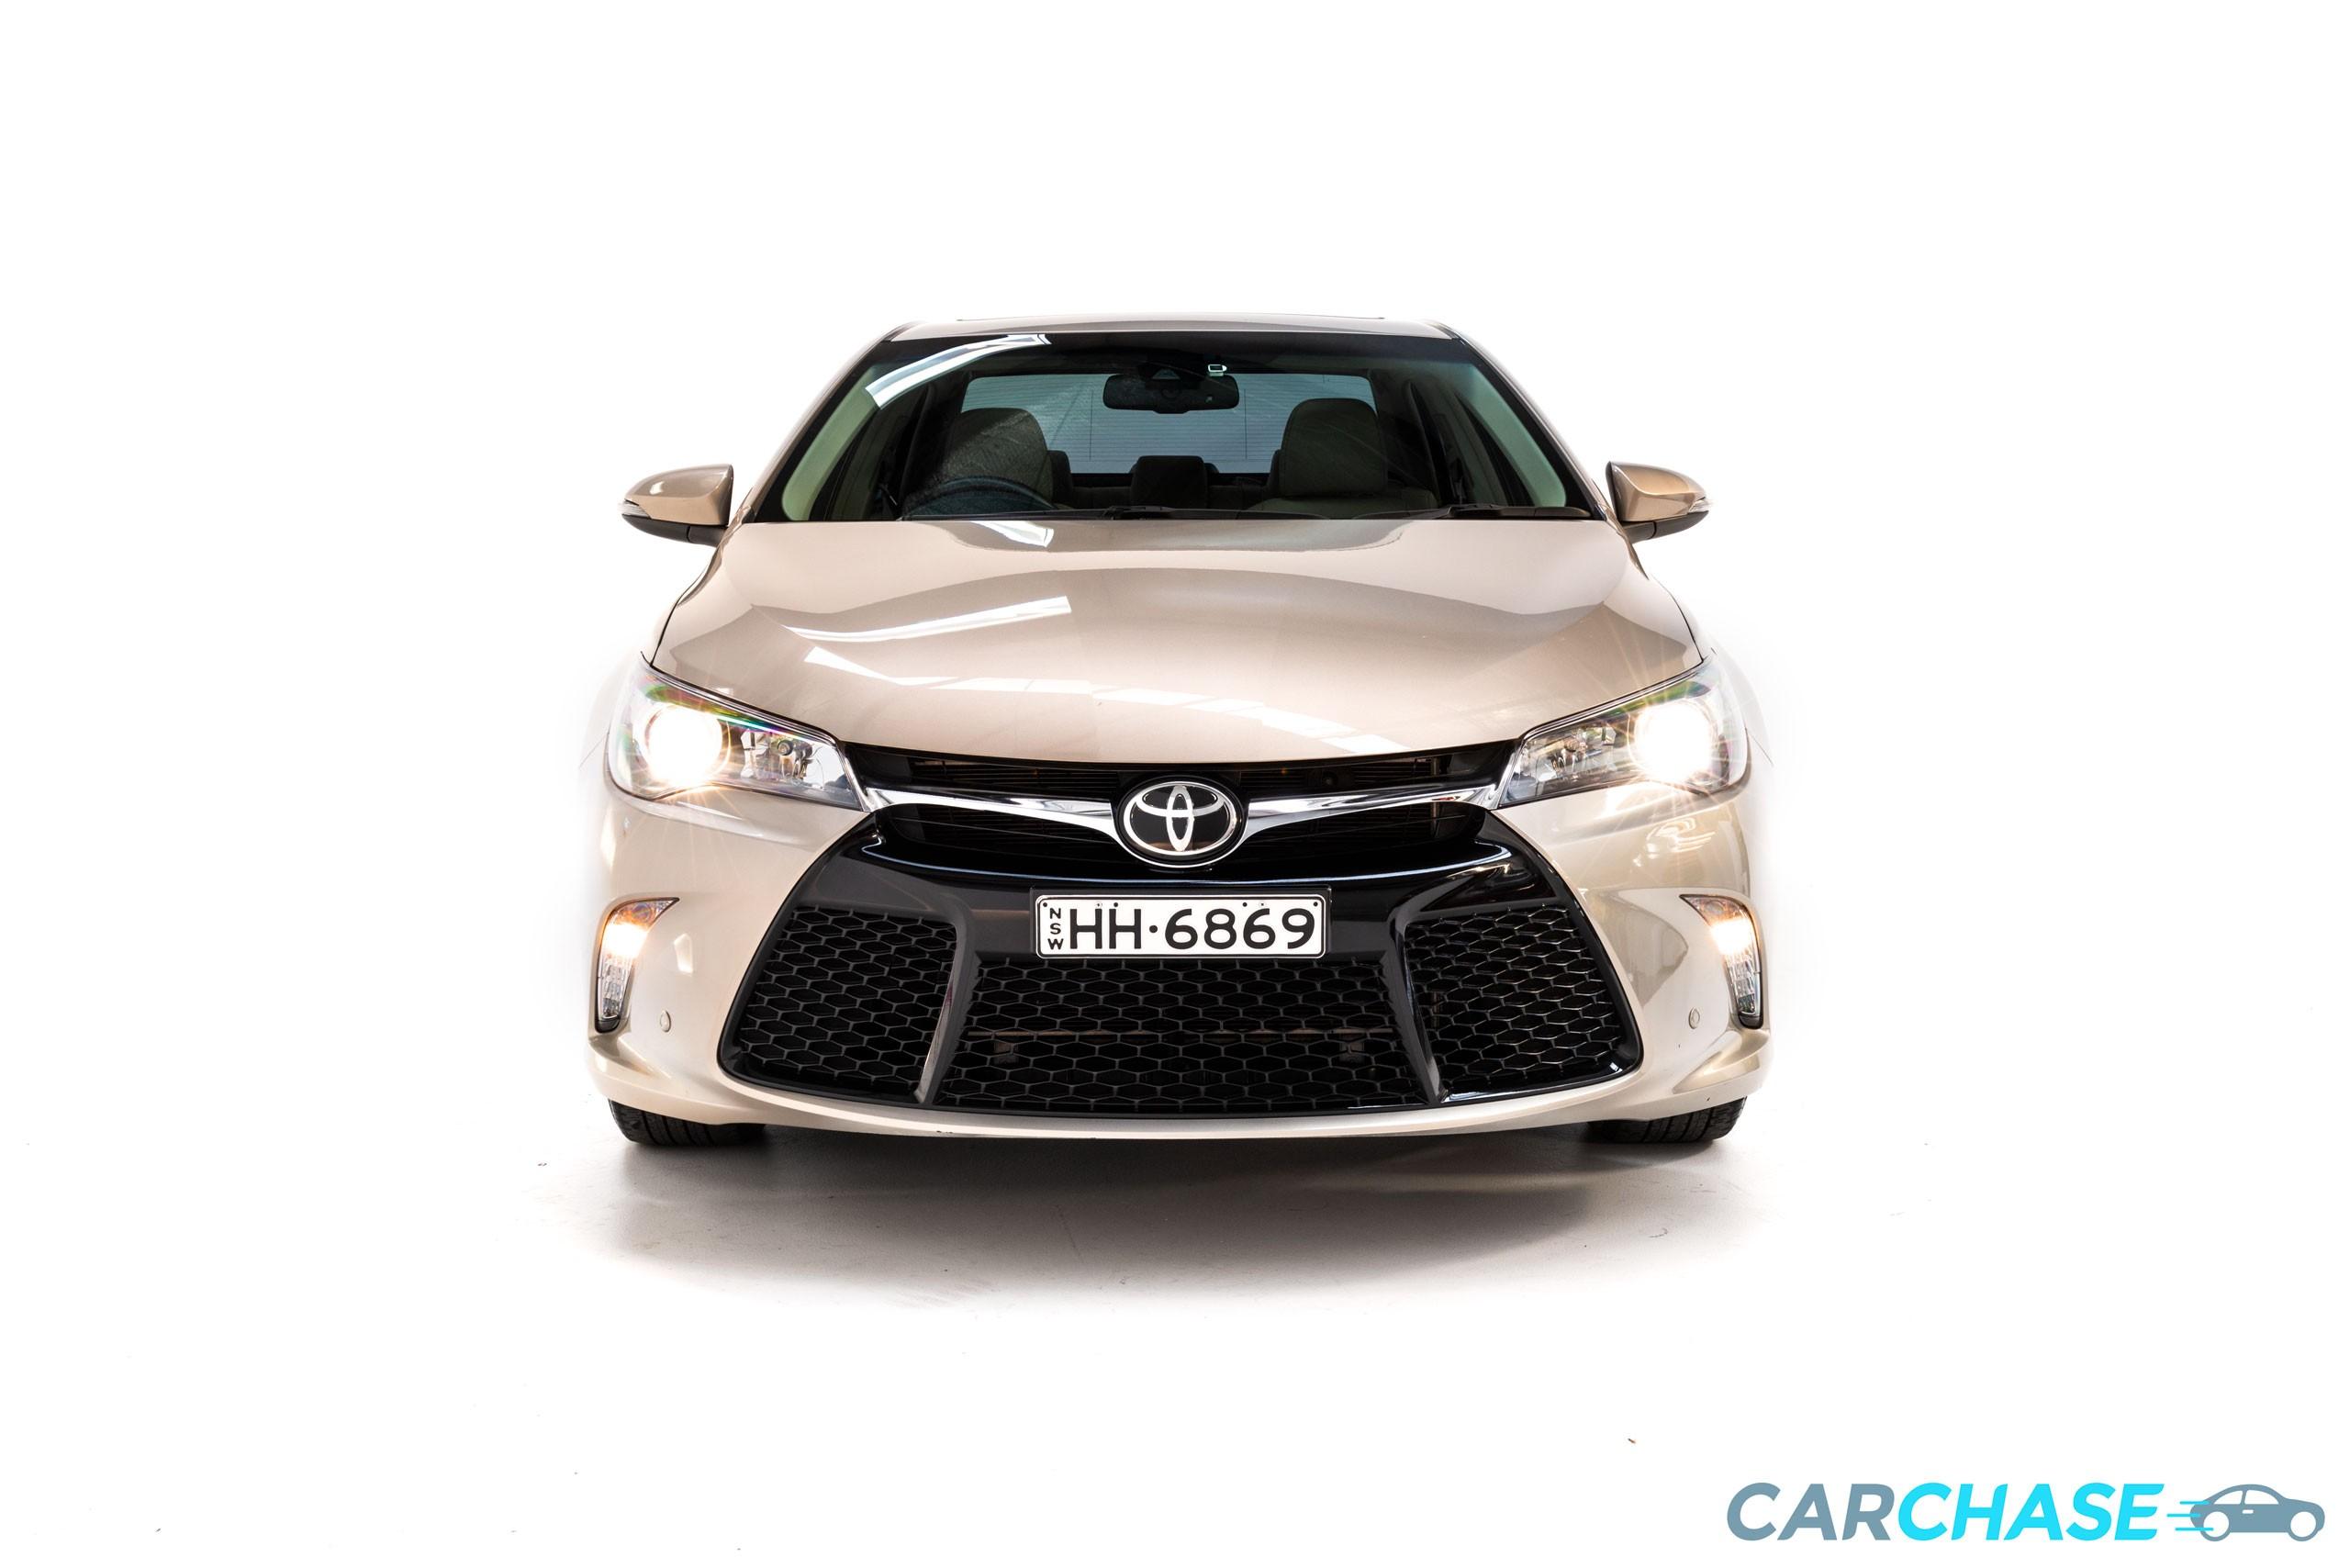 Image of front profile of 2015 Toyota Camry Atara SL